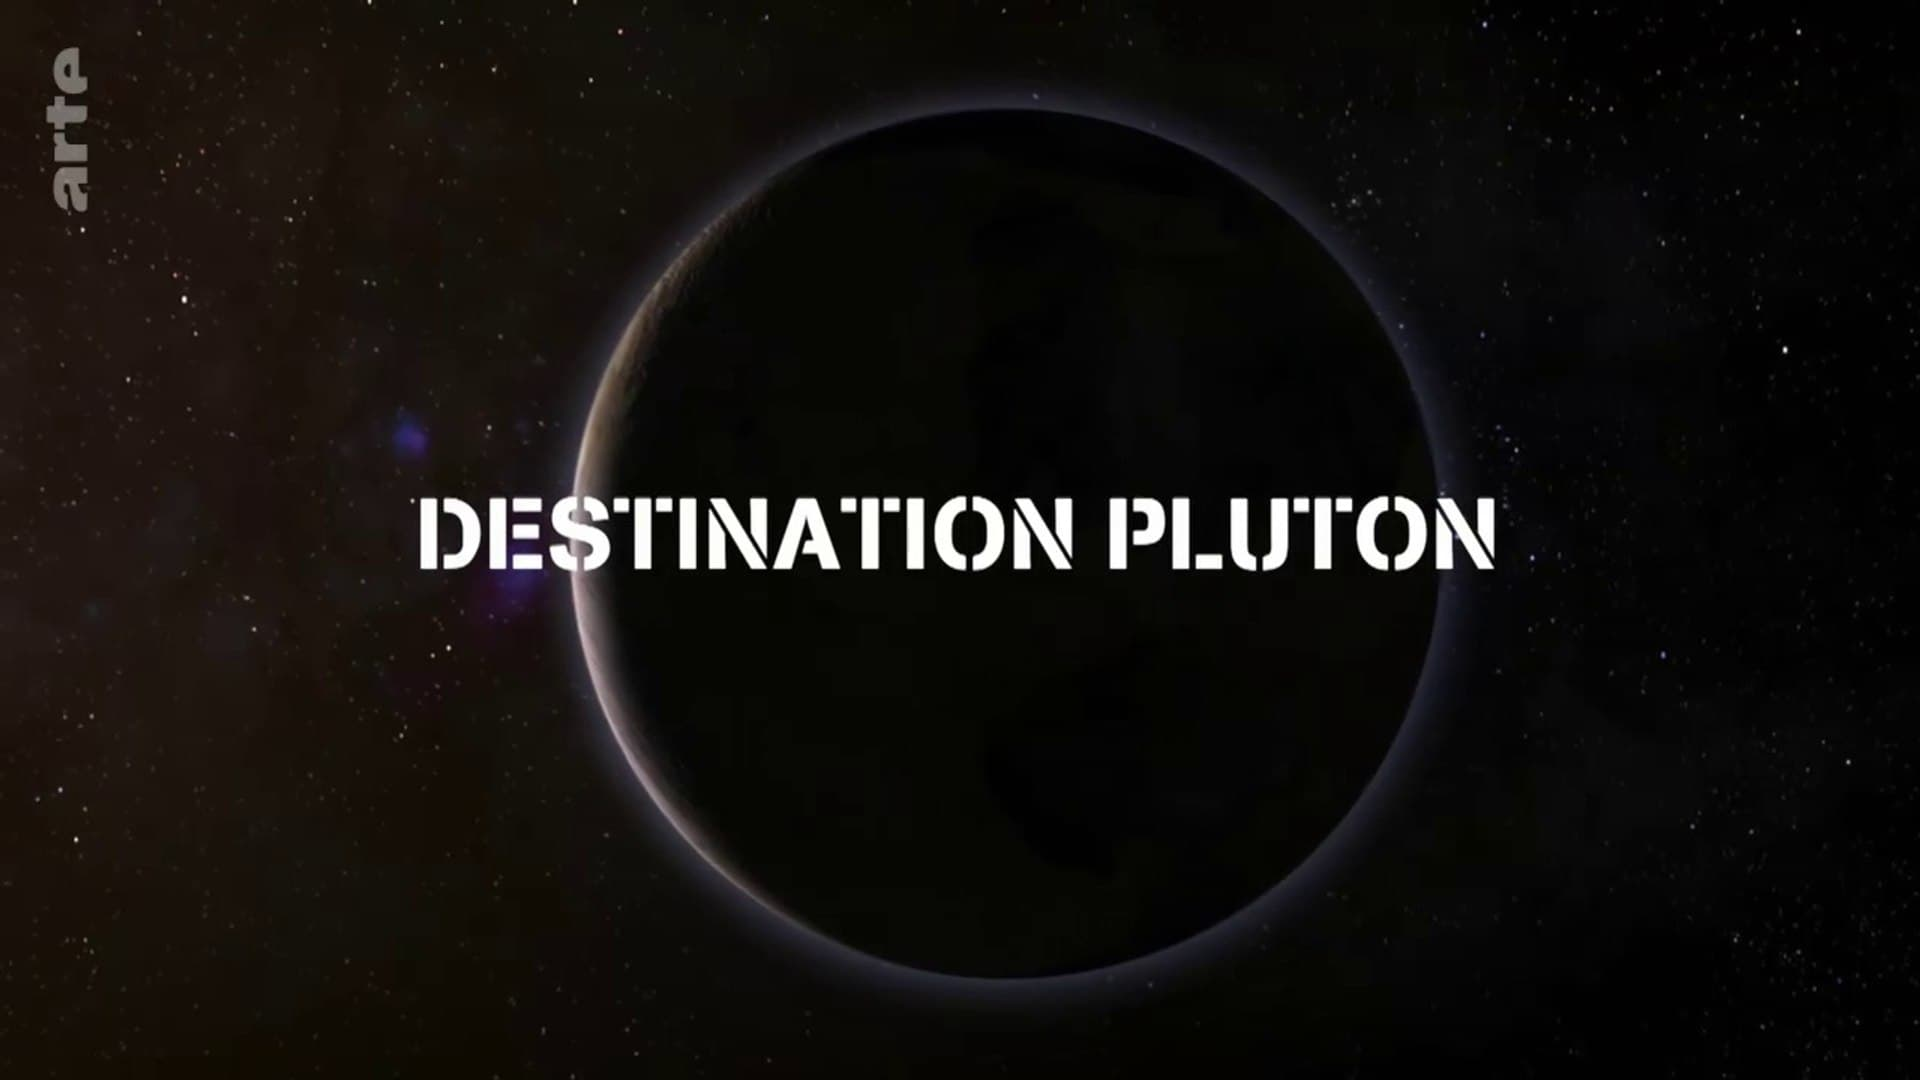 pluto and beyond - HD1920×1080